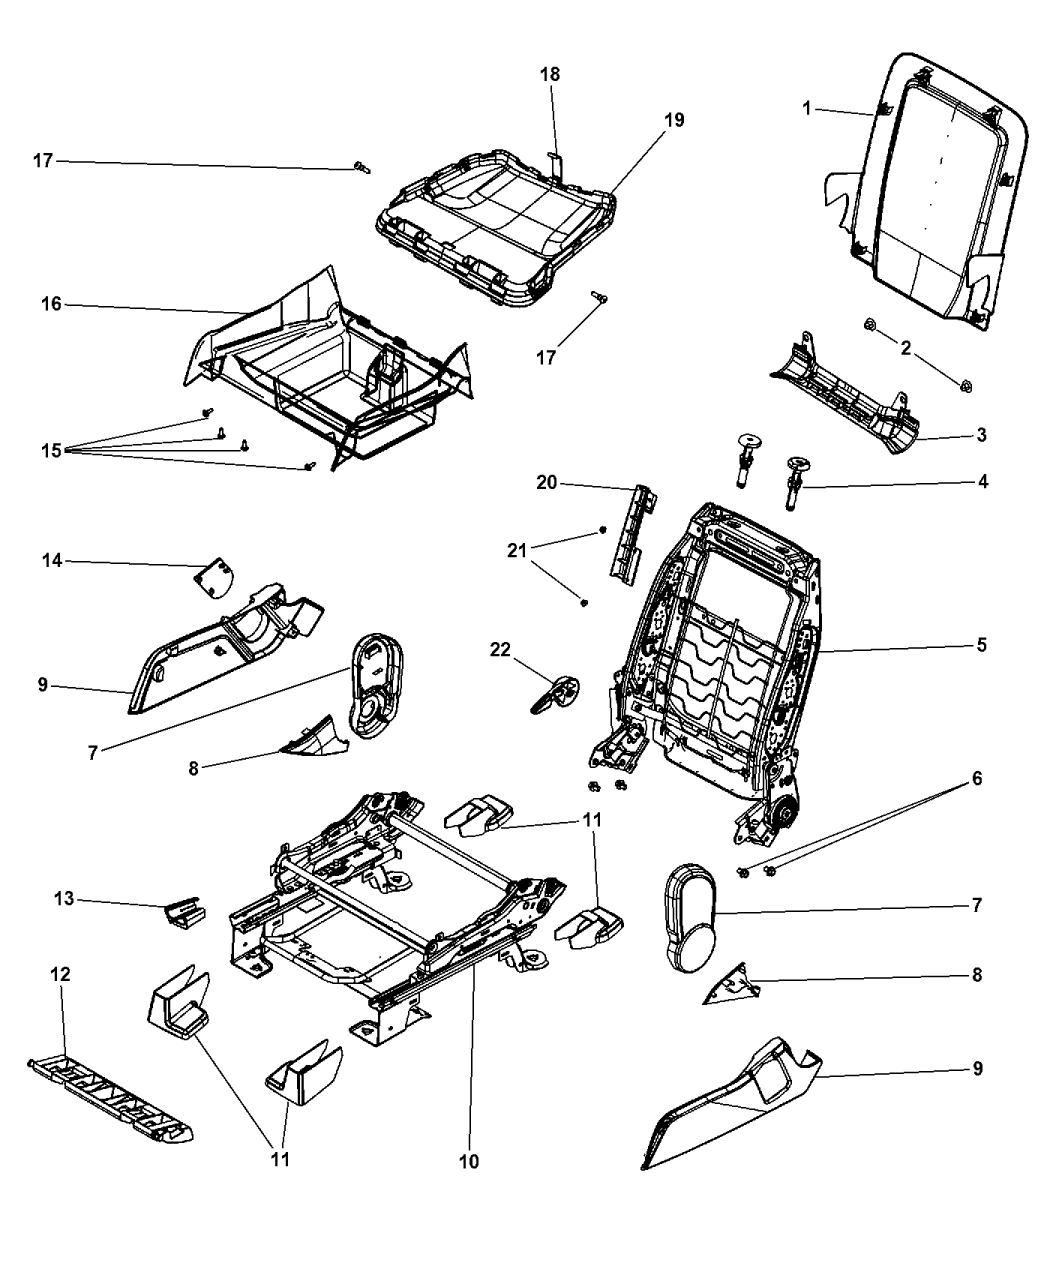 2009 Dodge Journey Seat Diagram